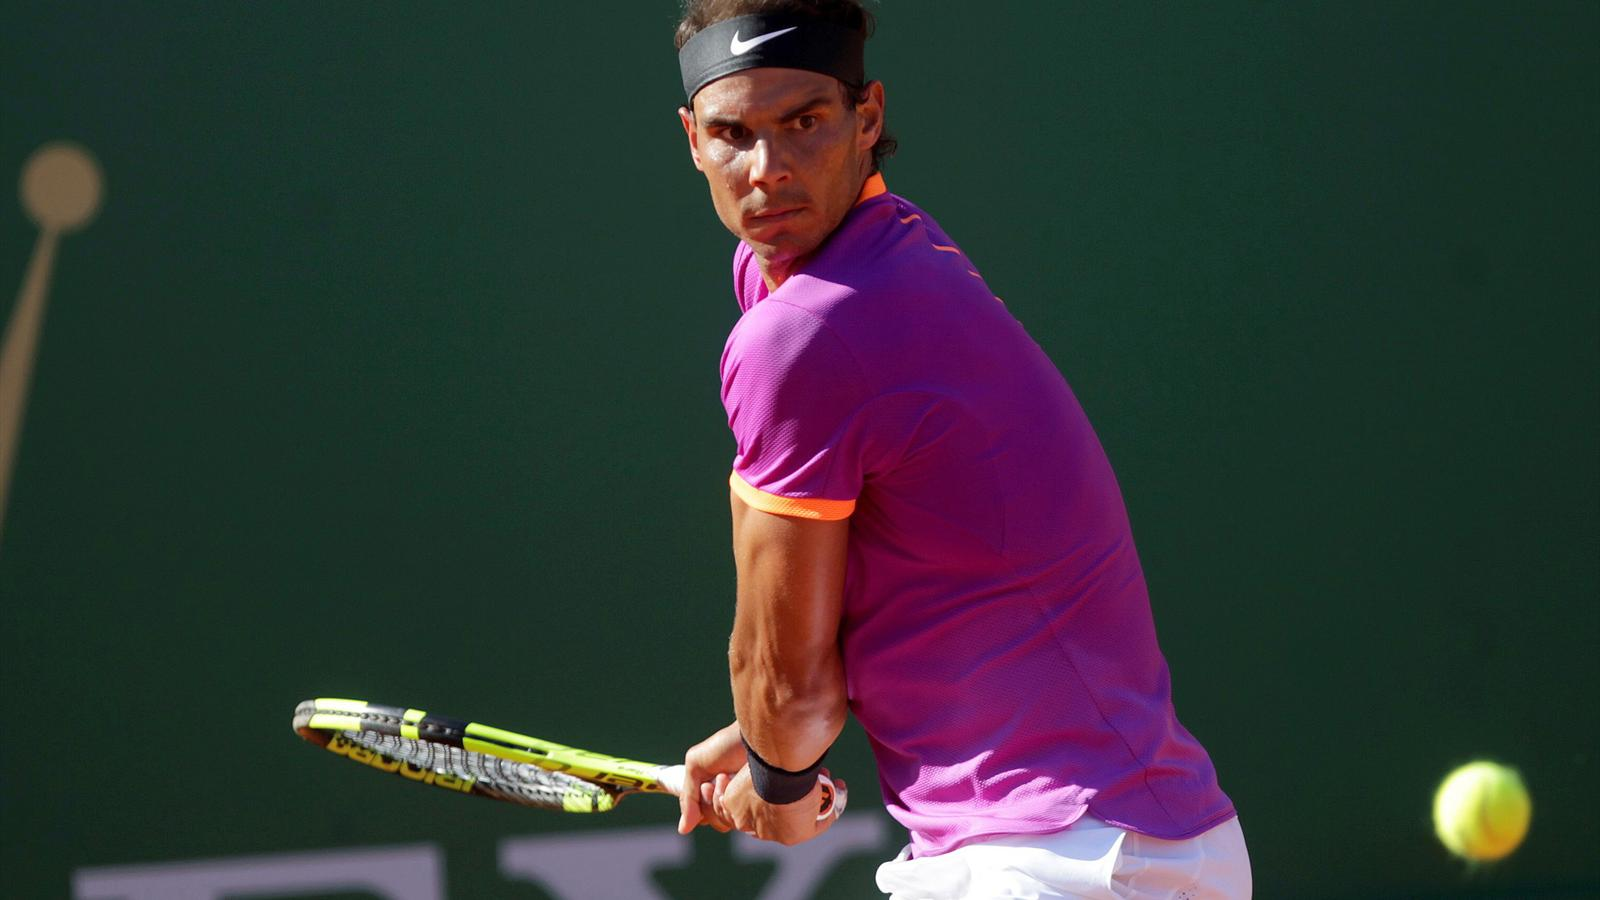 rafael nadal steht im masters finale monte carlo atp masters monte carlo 2017 tennis